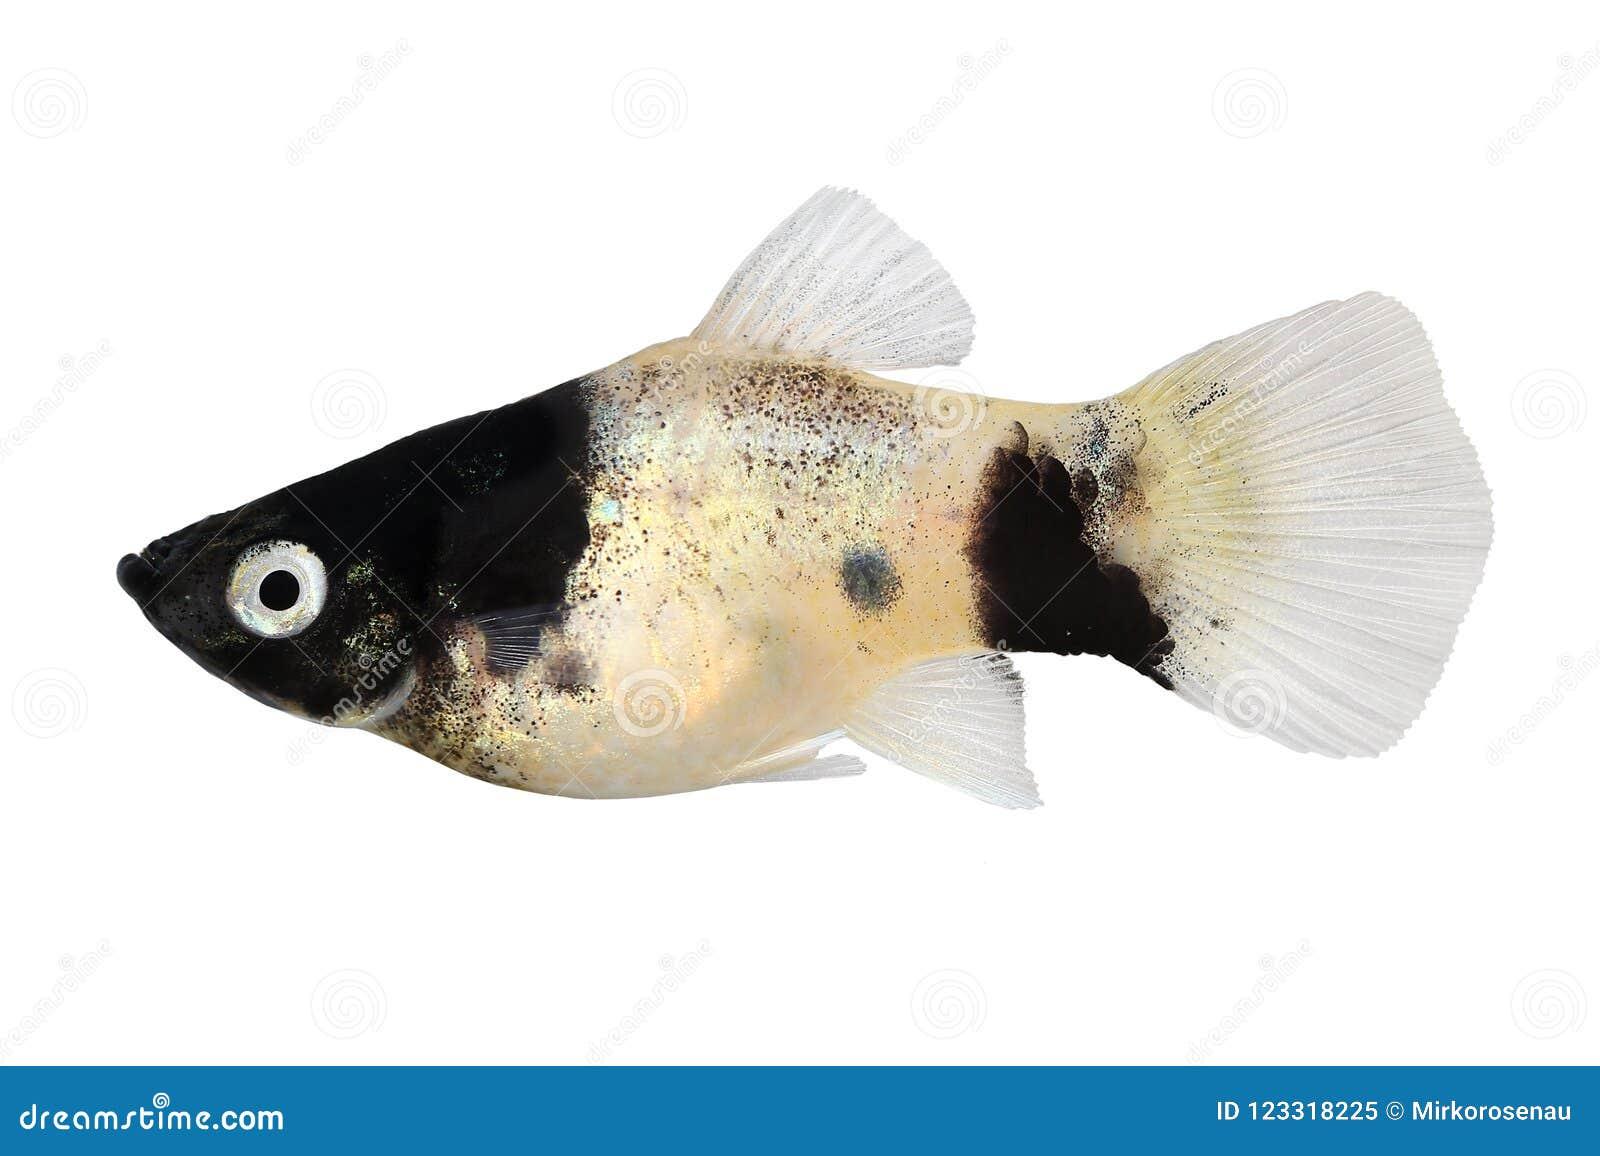 Panda Platy platy male Xiphophorus maculatus tropical aquarium fish